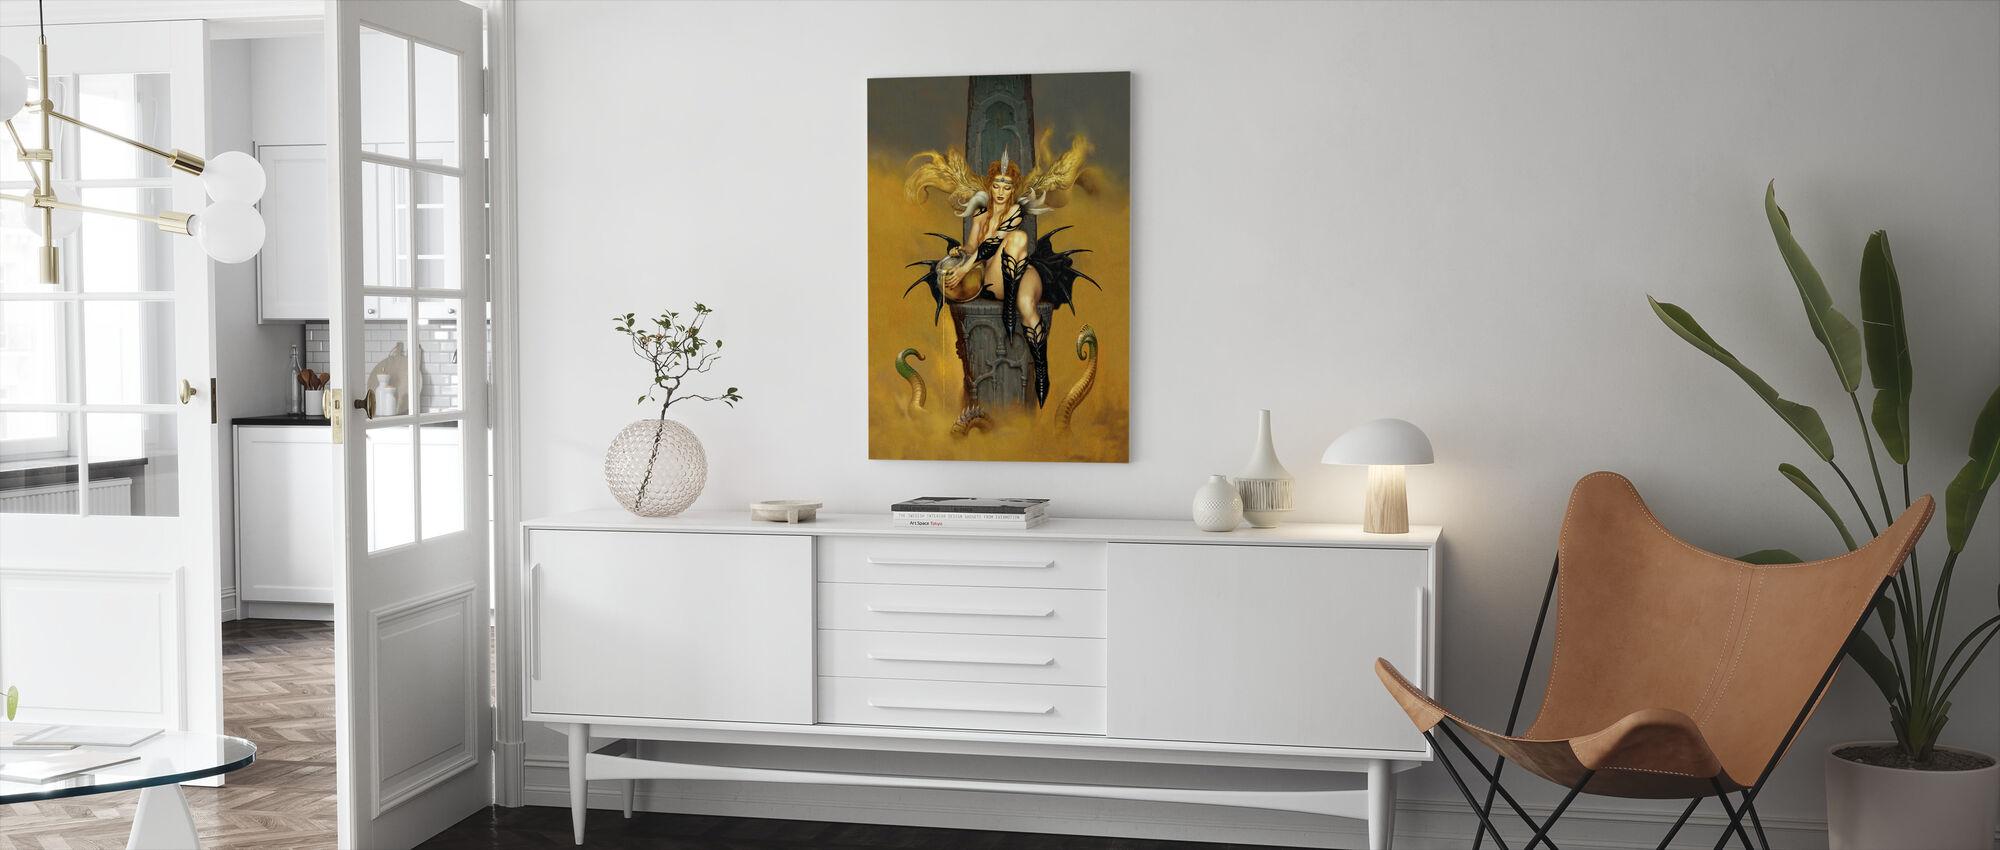 Queen B - Canvas print - Living Room